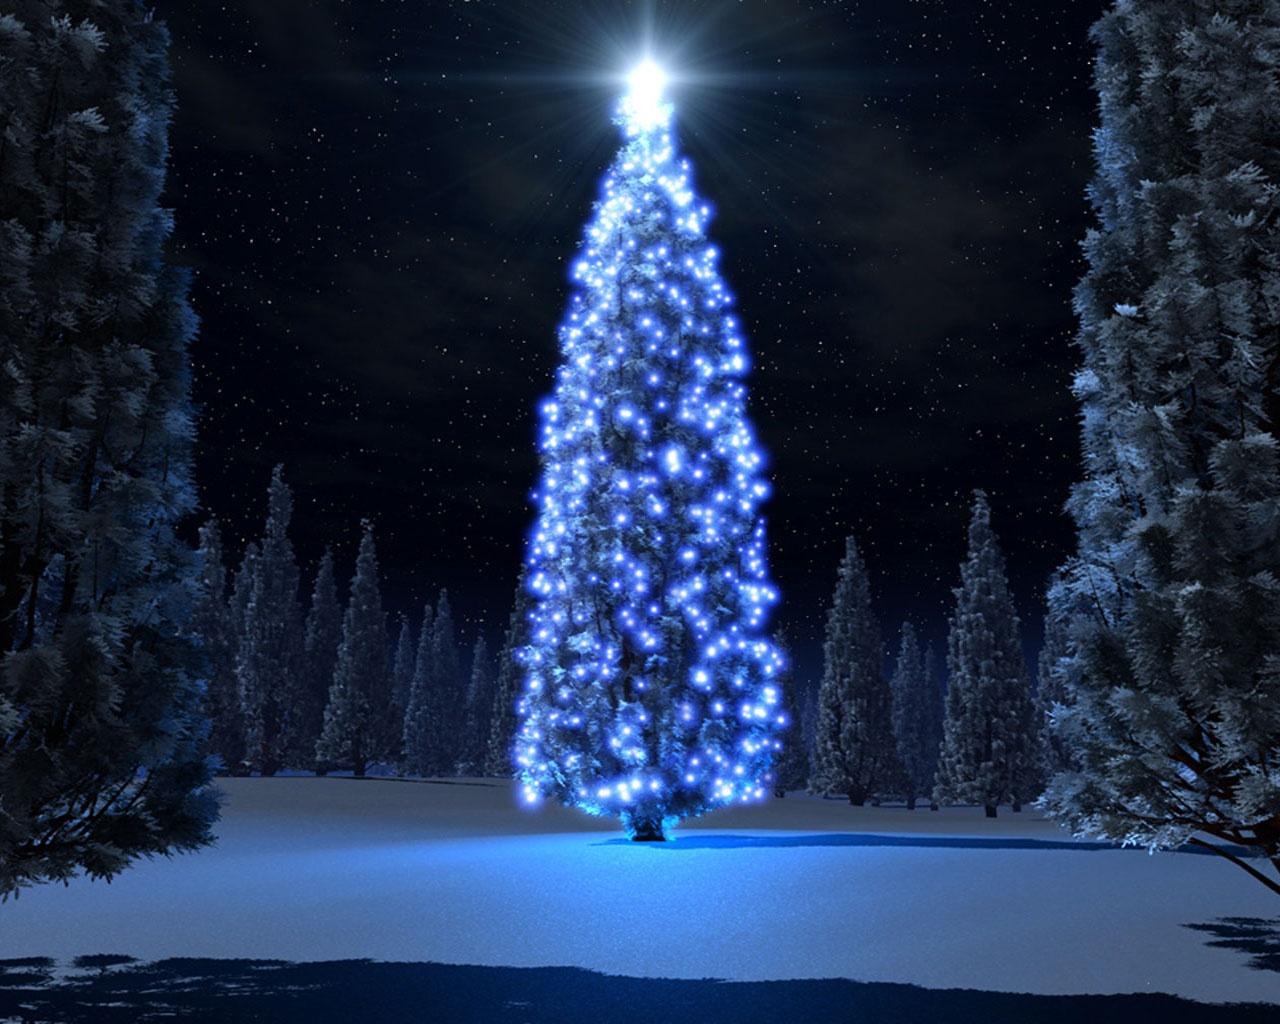 1280x1024 Christmas blue tree desktop PC and Mac wallpaper 1280x1024